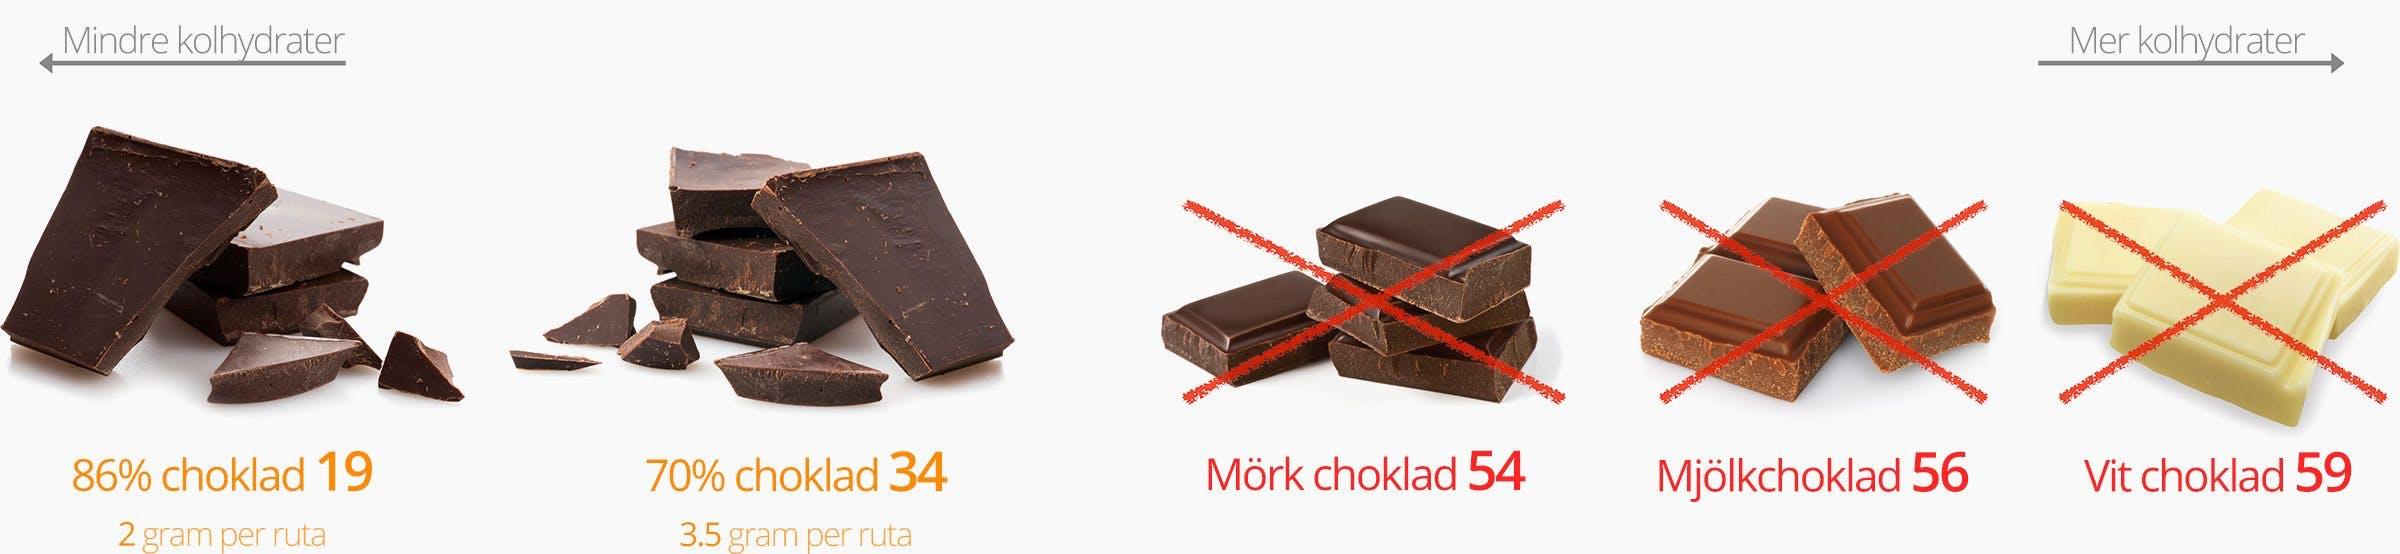 choklad-svenska